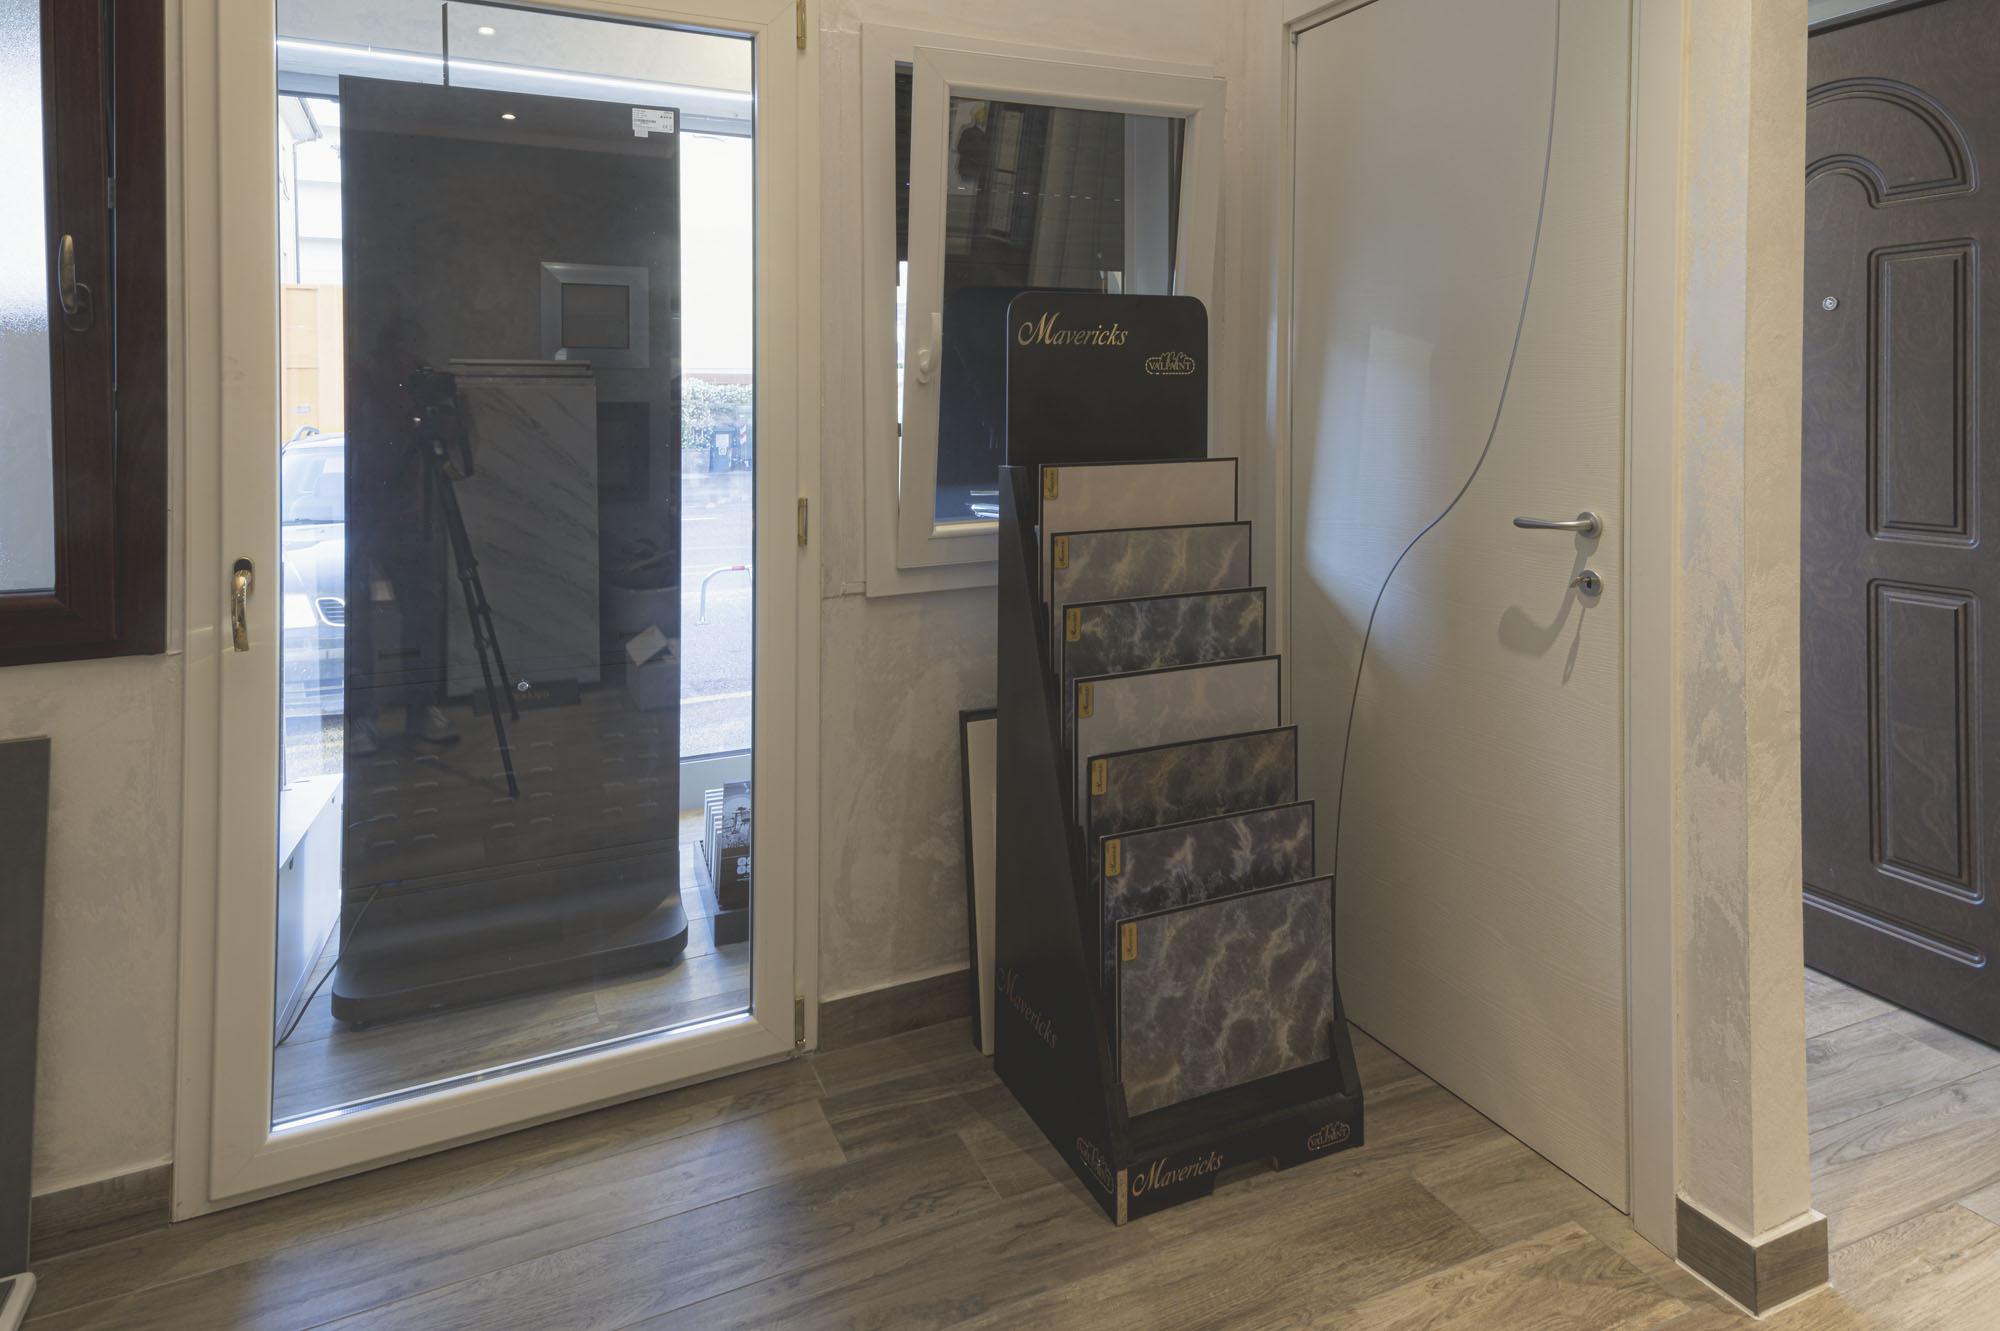 DSC5866 - Showroom ristrutturazioni